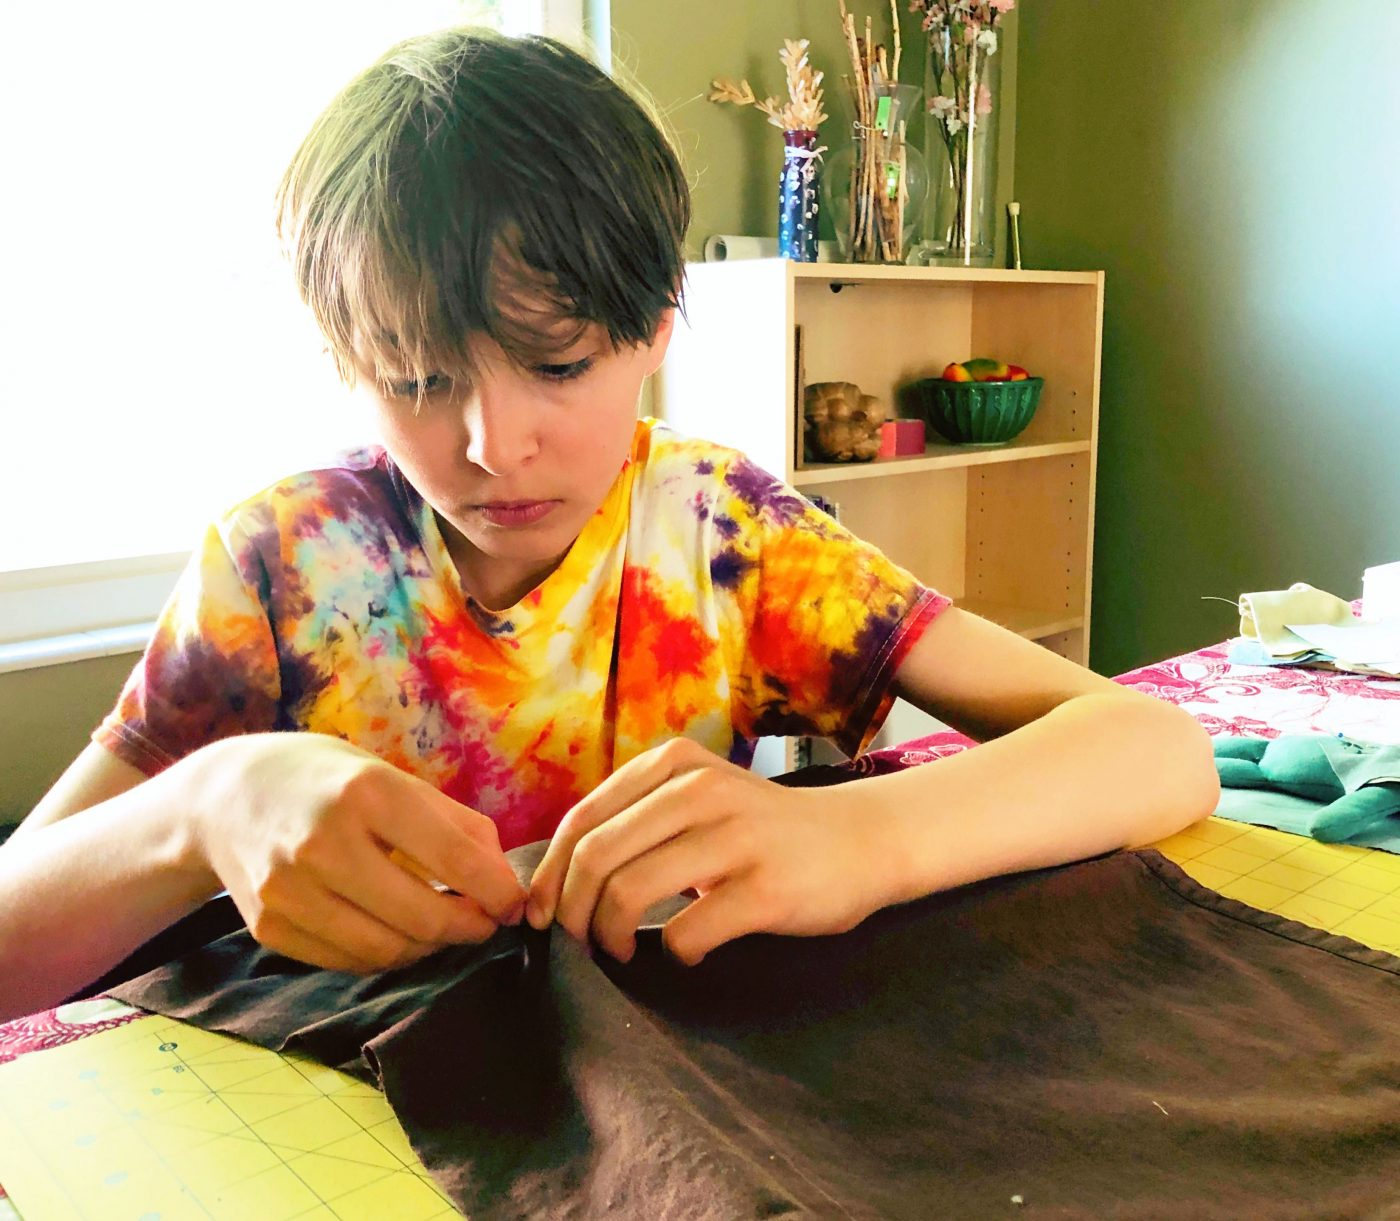 Sewing Rhegan's homeless cape